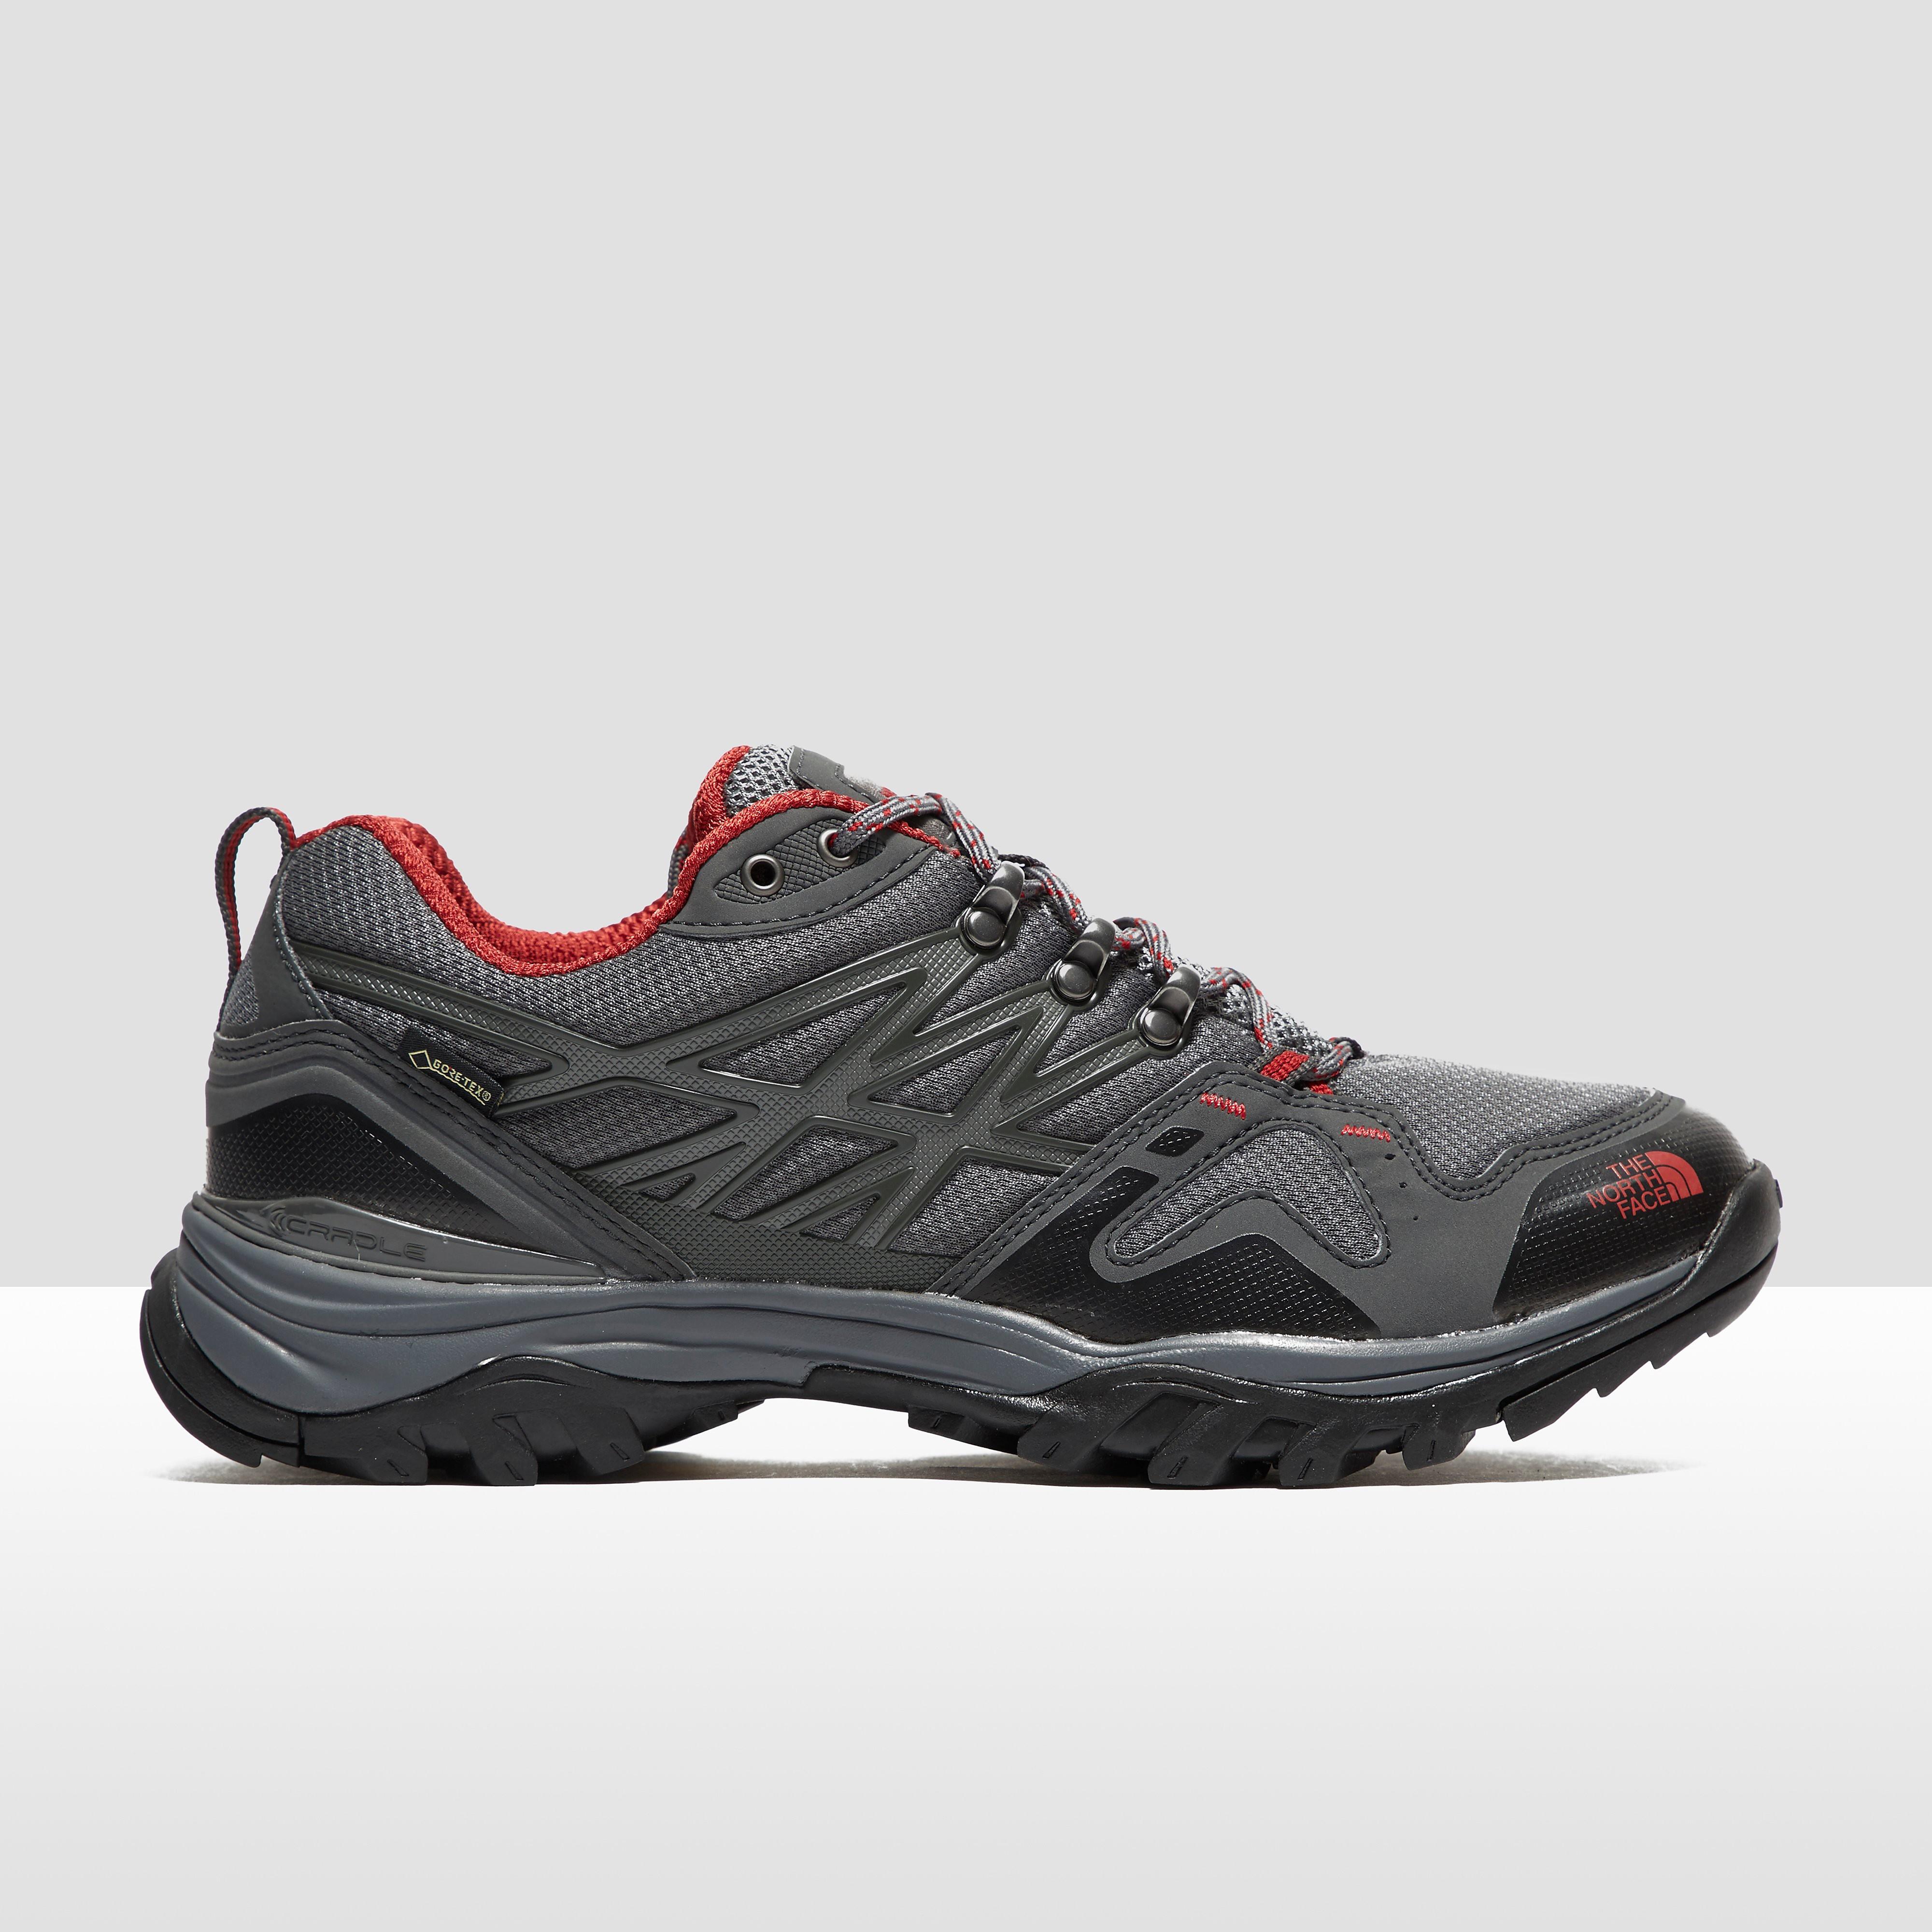 The North Face Hedgehog FastPack GTX Men's Walking Shoes